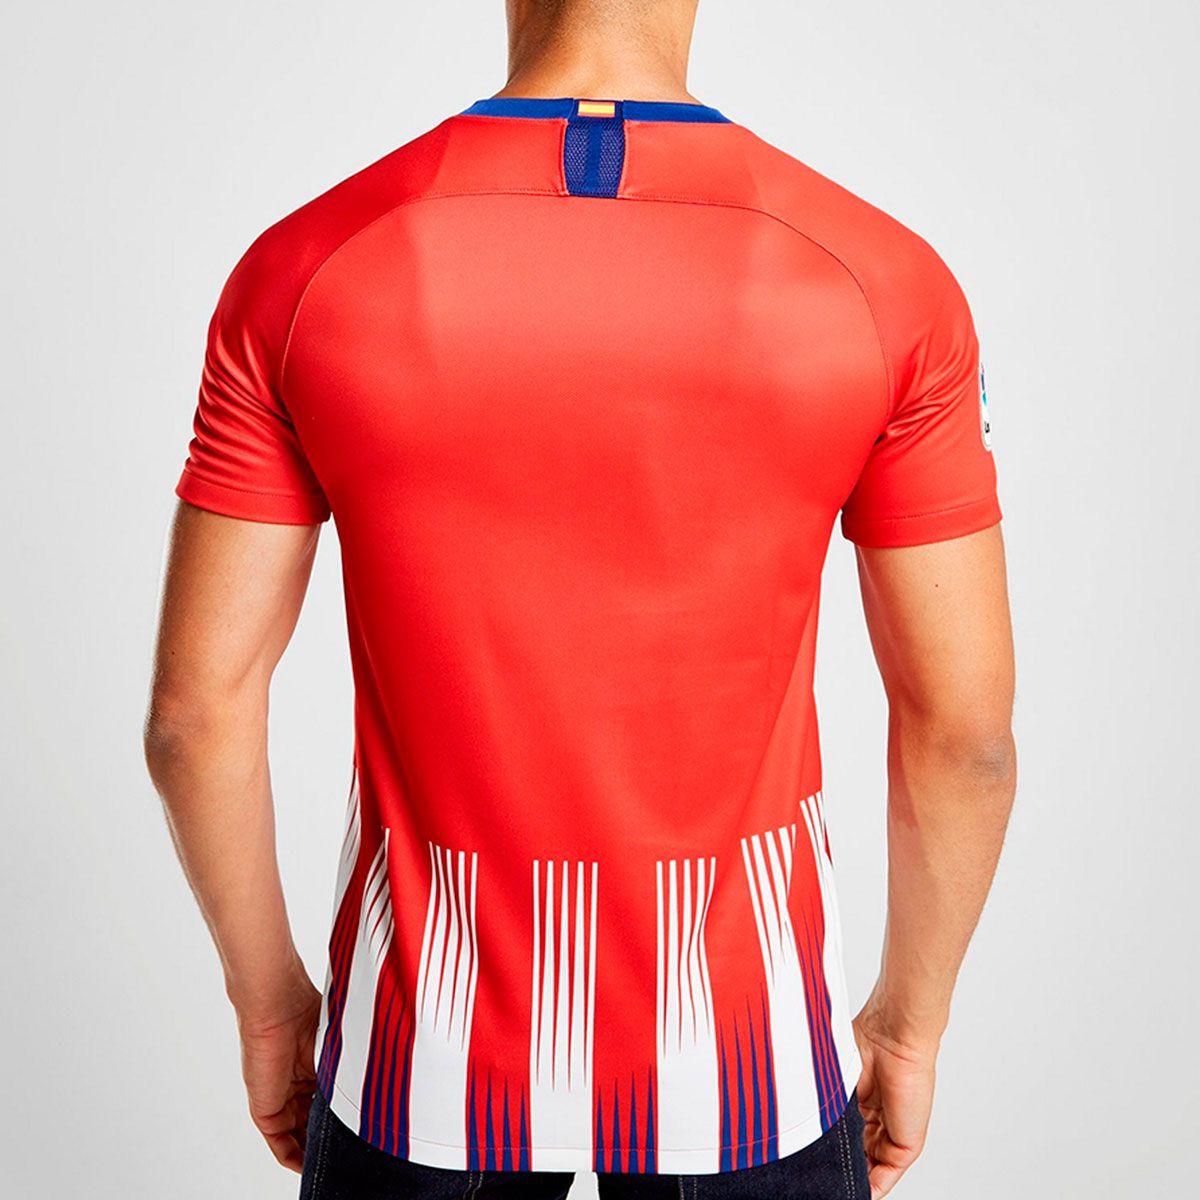 Camisa Nike Atlético de Madrid I 2018/19 Torcedor Masculina